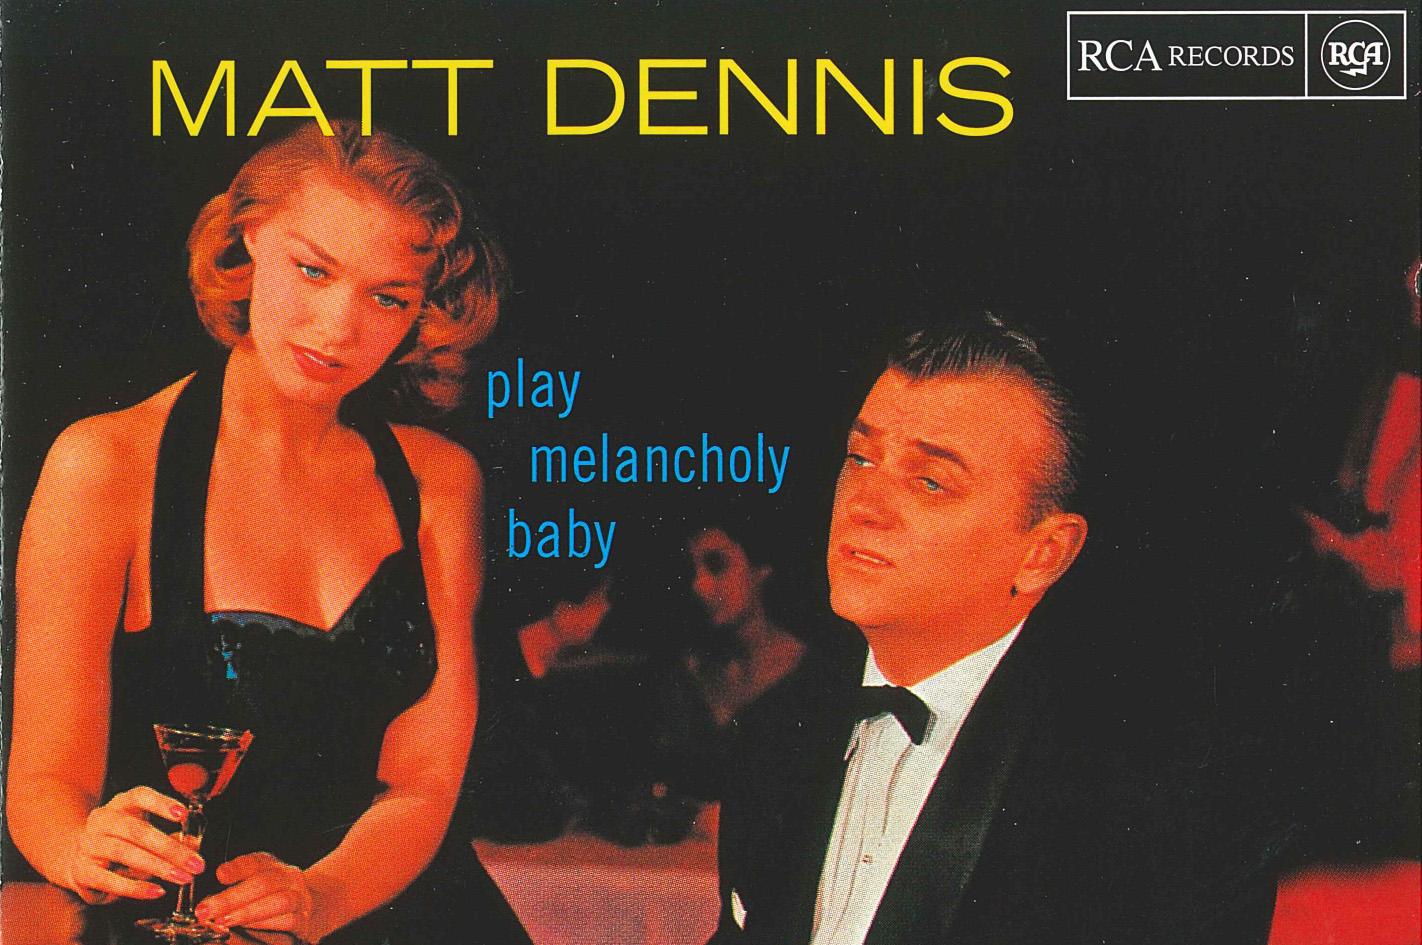 Matt Dennis - Play Melancholy Baby